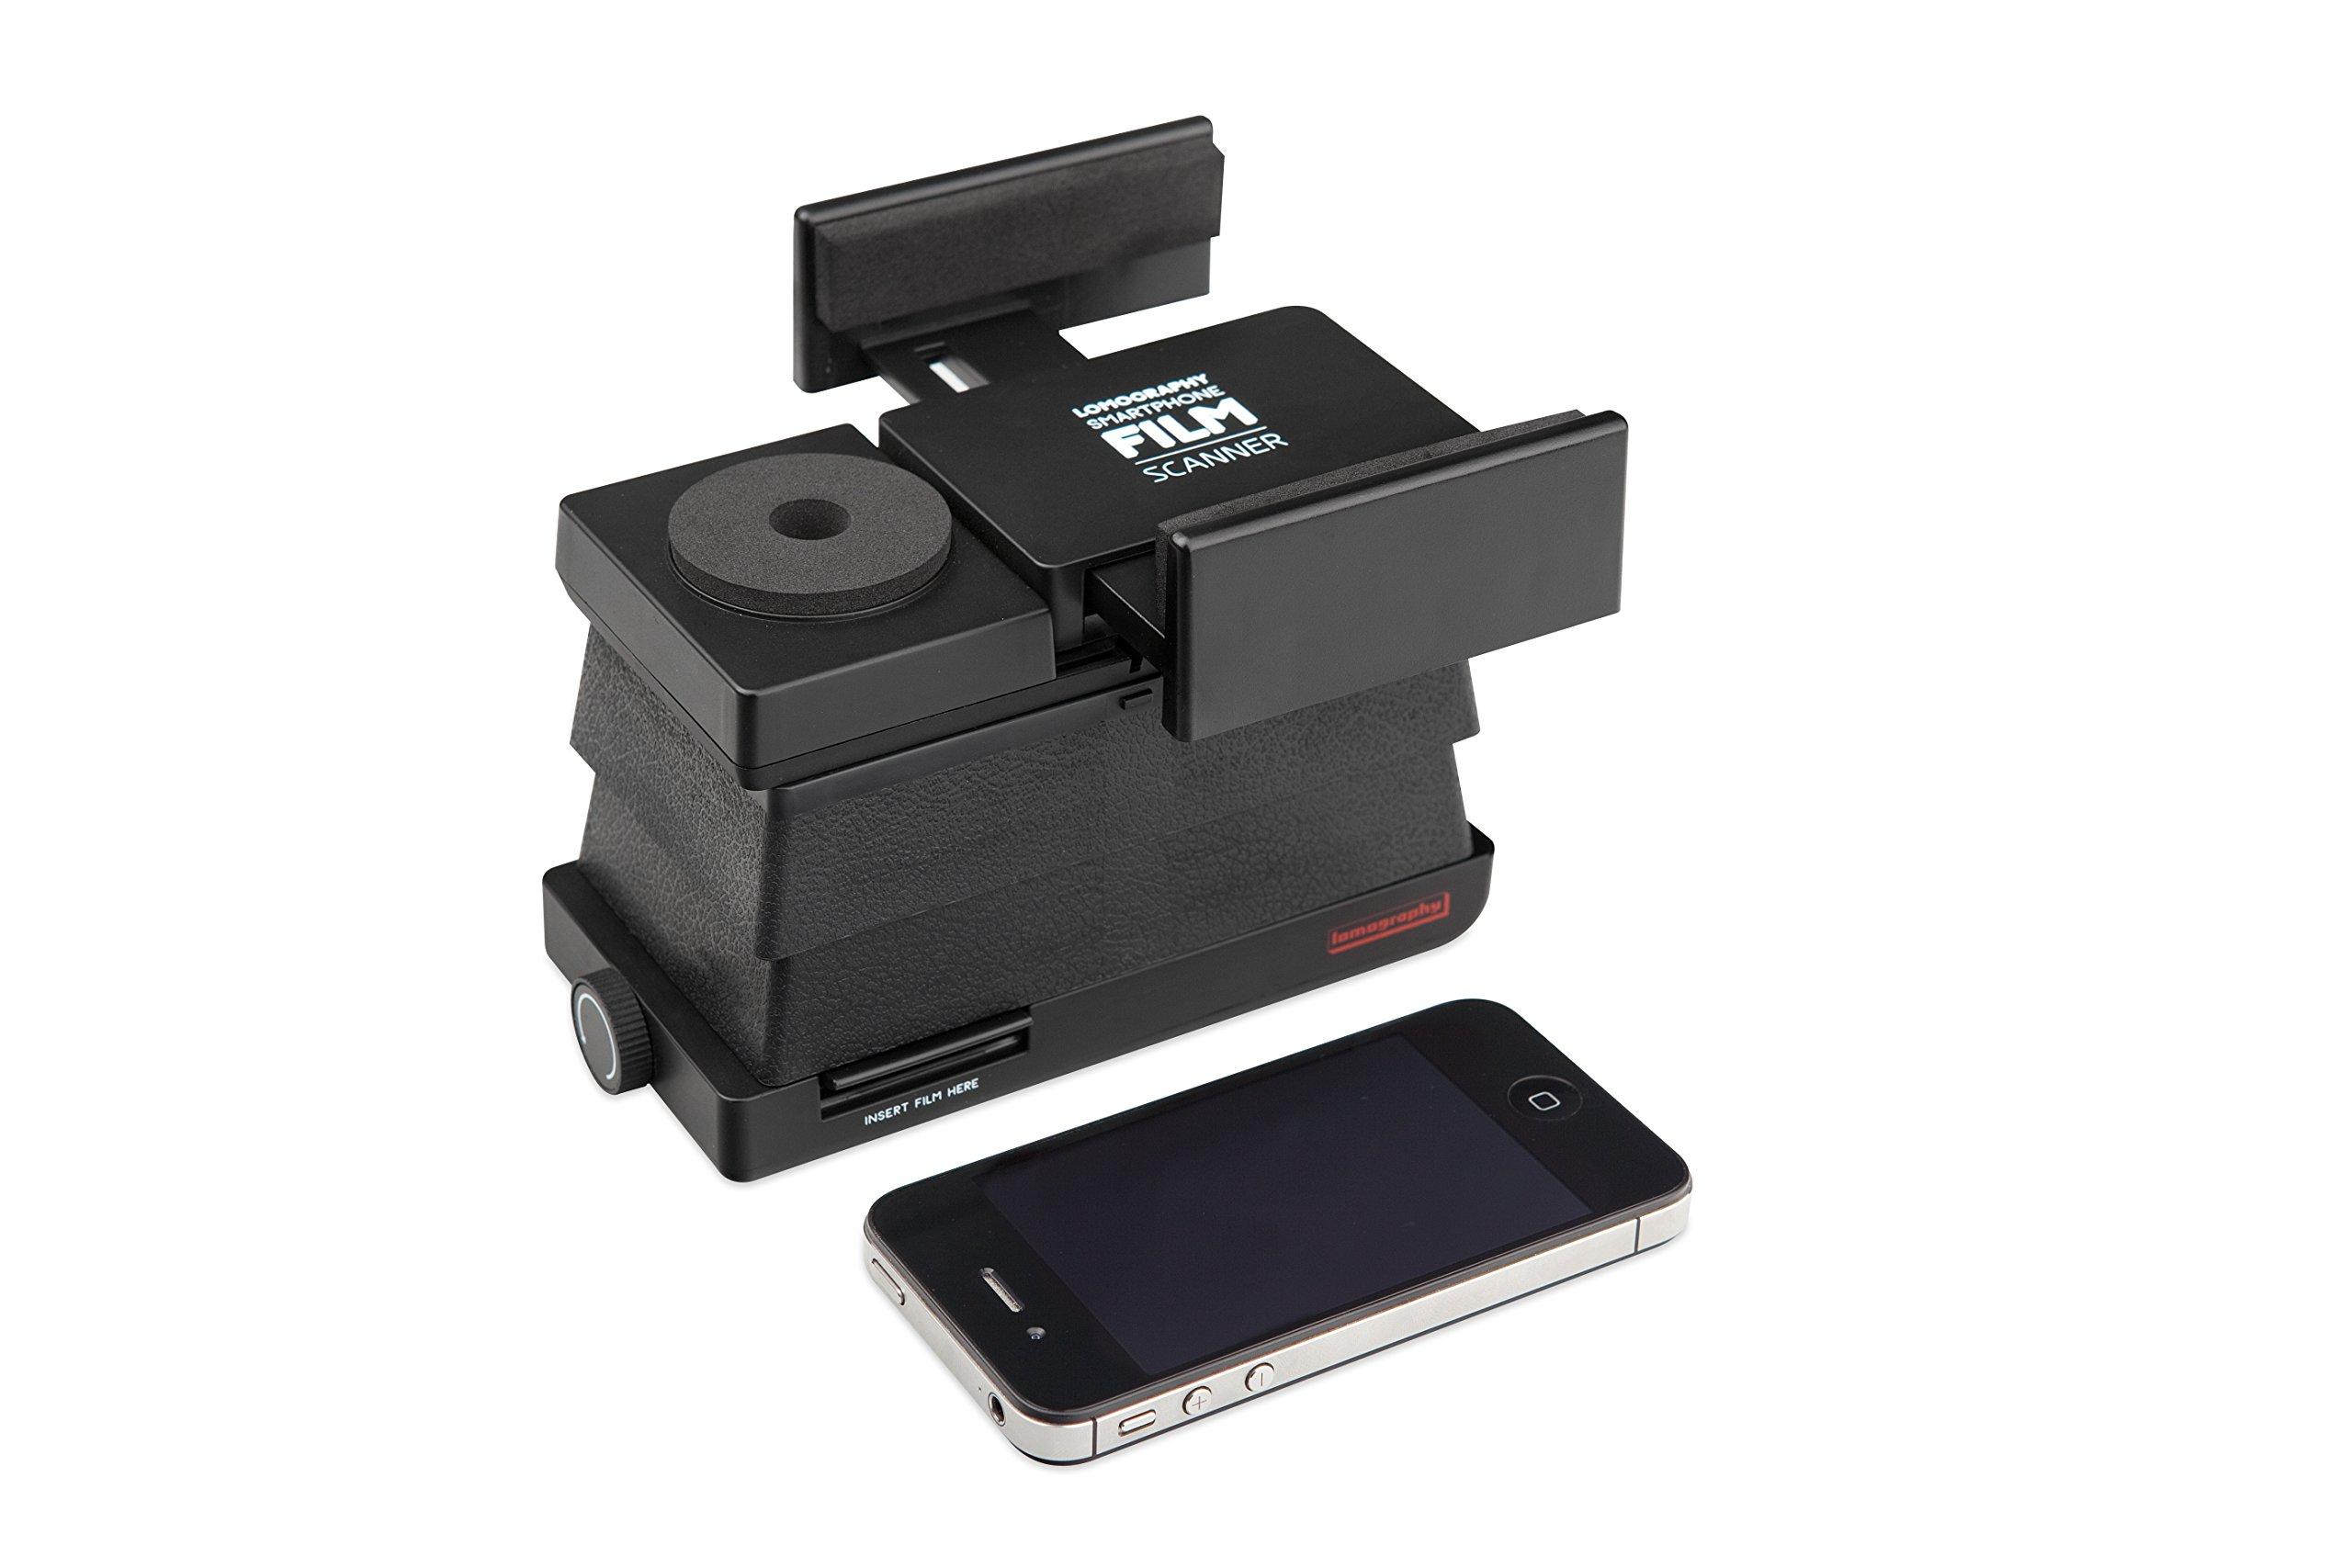 Lomography Smartphone Film Photo Scanner by Lomography